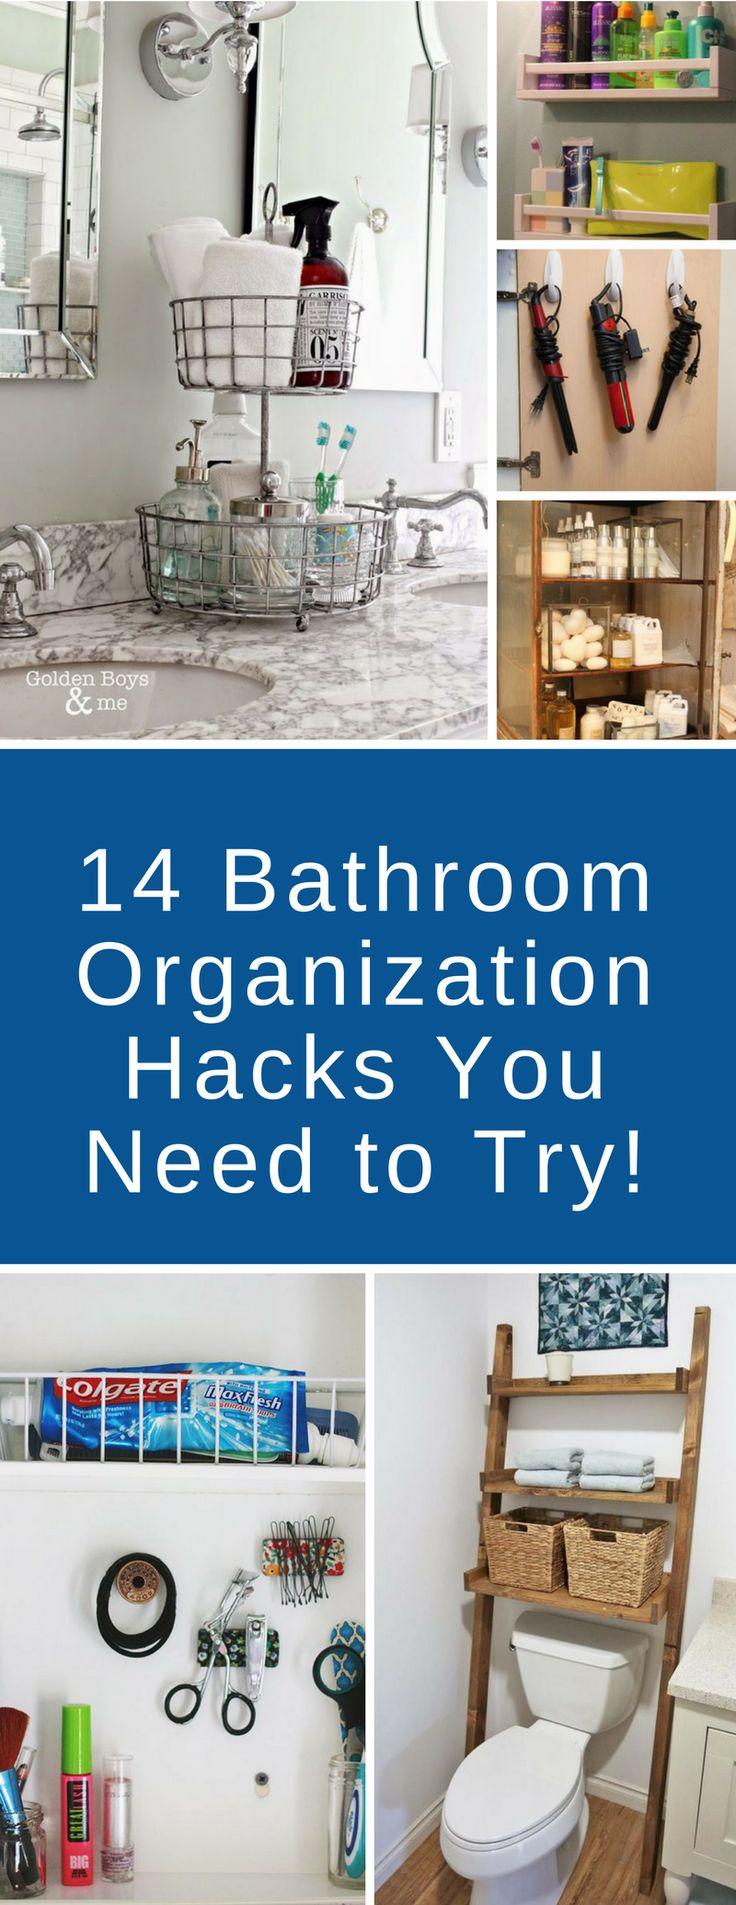 best 25+ bathroom organization ideas on pinterest | restroom ideas